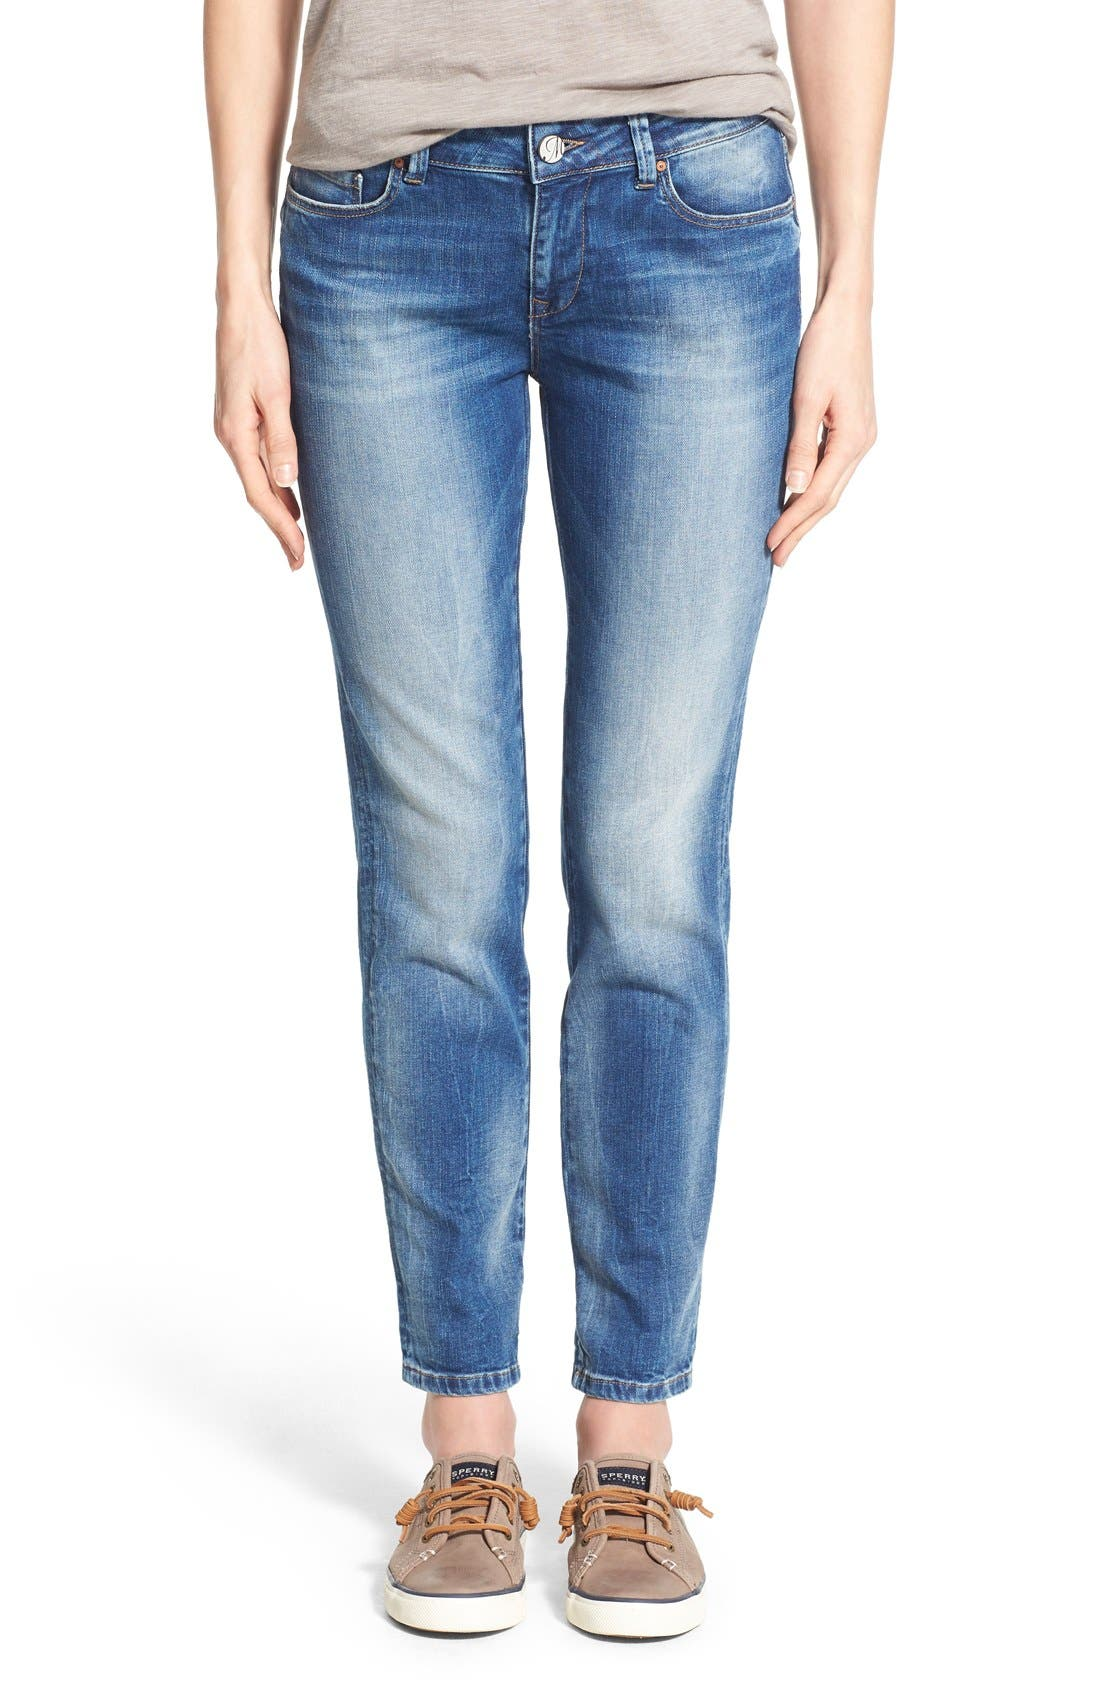 Alternate Image 1 Selected - Mavi Jeans 'Emma' Stretch Slim Boyfriend Jeans (Shaded Vintage)